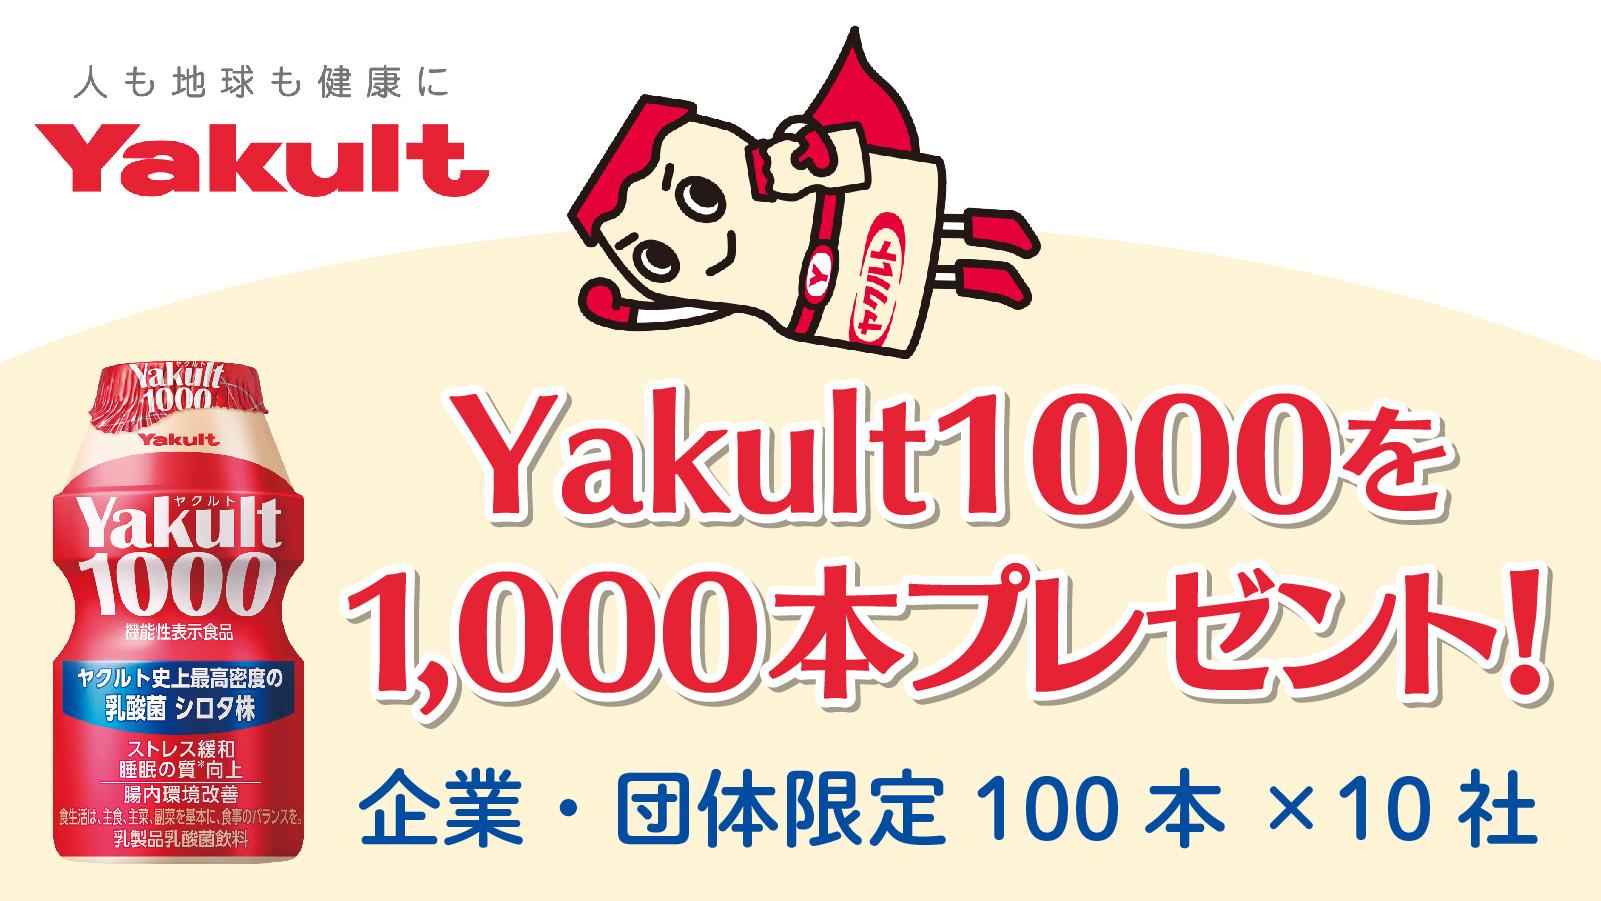 Yakult1000 プレゼントキャンペーン